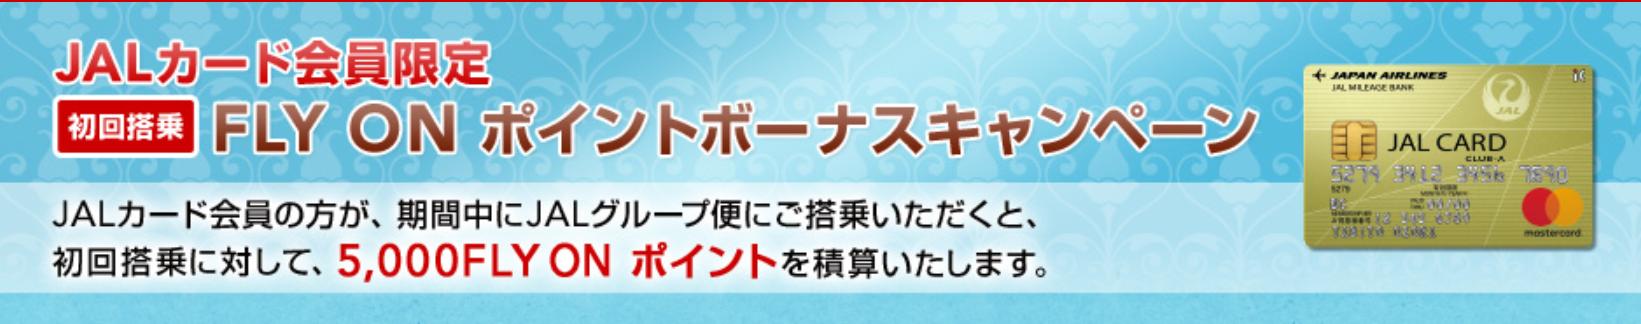 JALカード会員限定FLY ON ポイントボーナスキャンペーン